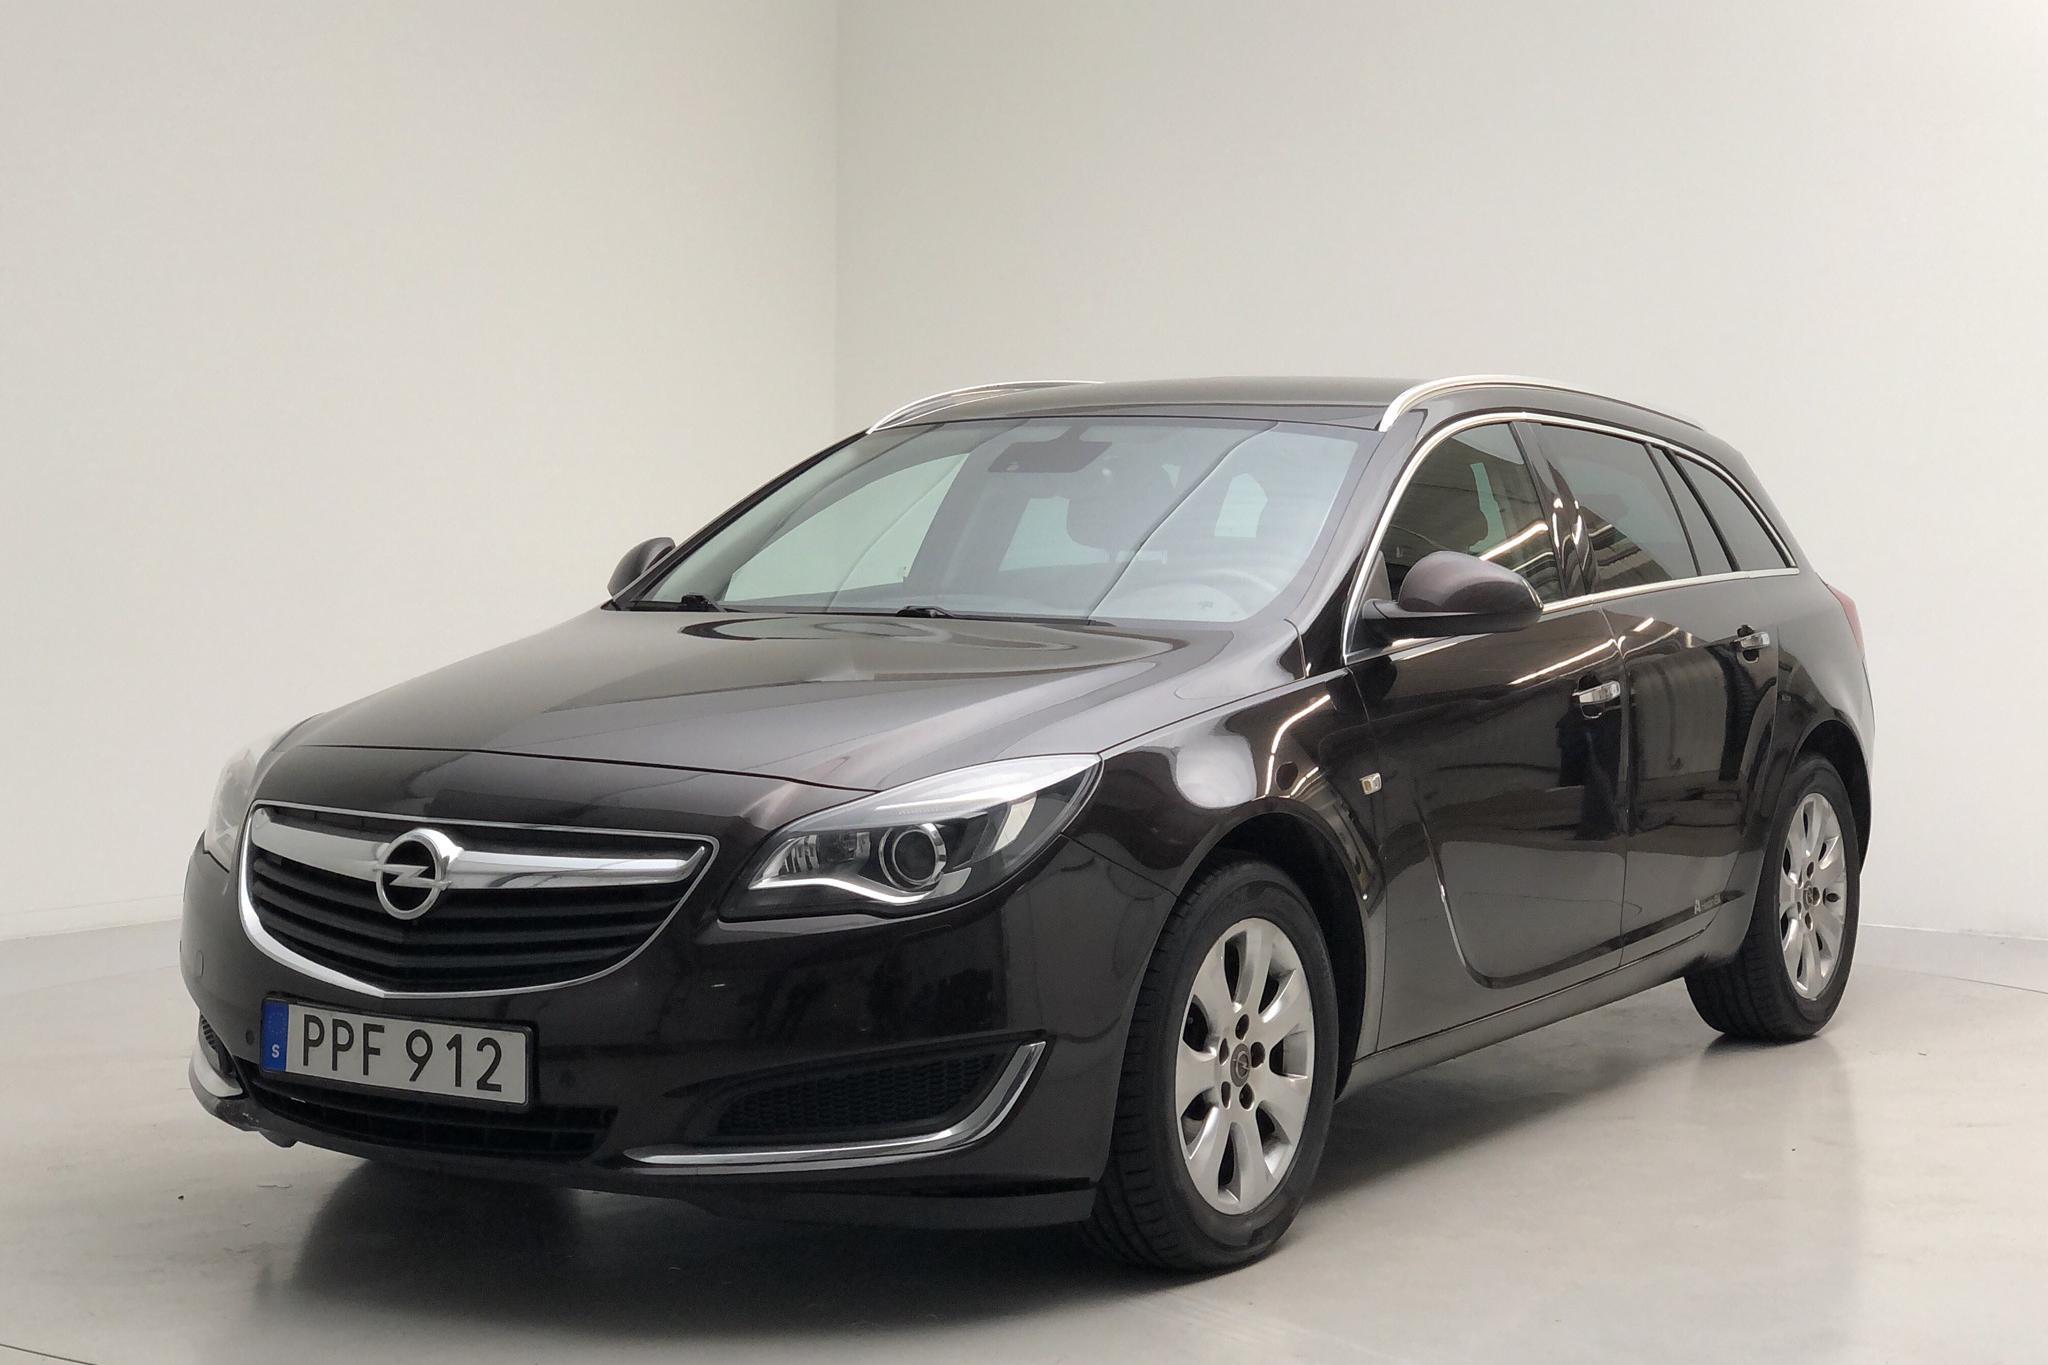 Opel Insignia 1.6 CDTI ecoFLEX Sports Tourer (136hk) - 83 060 km - Automatic - brown - 2016